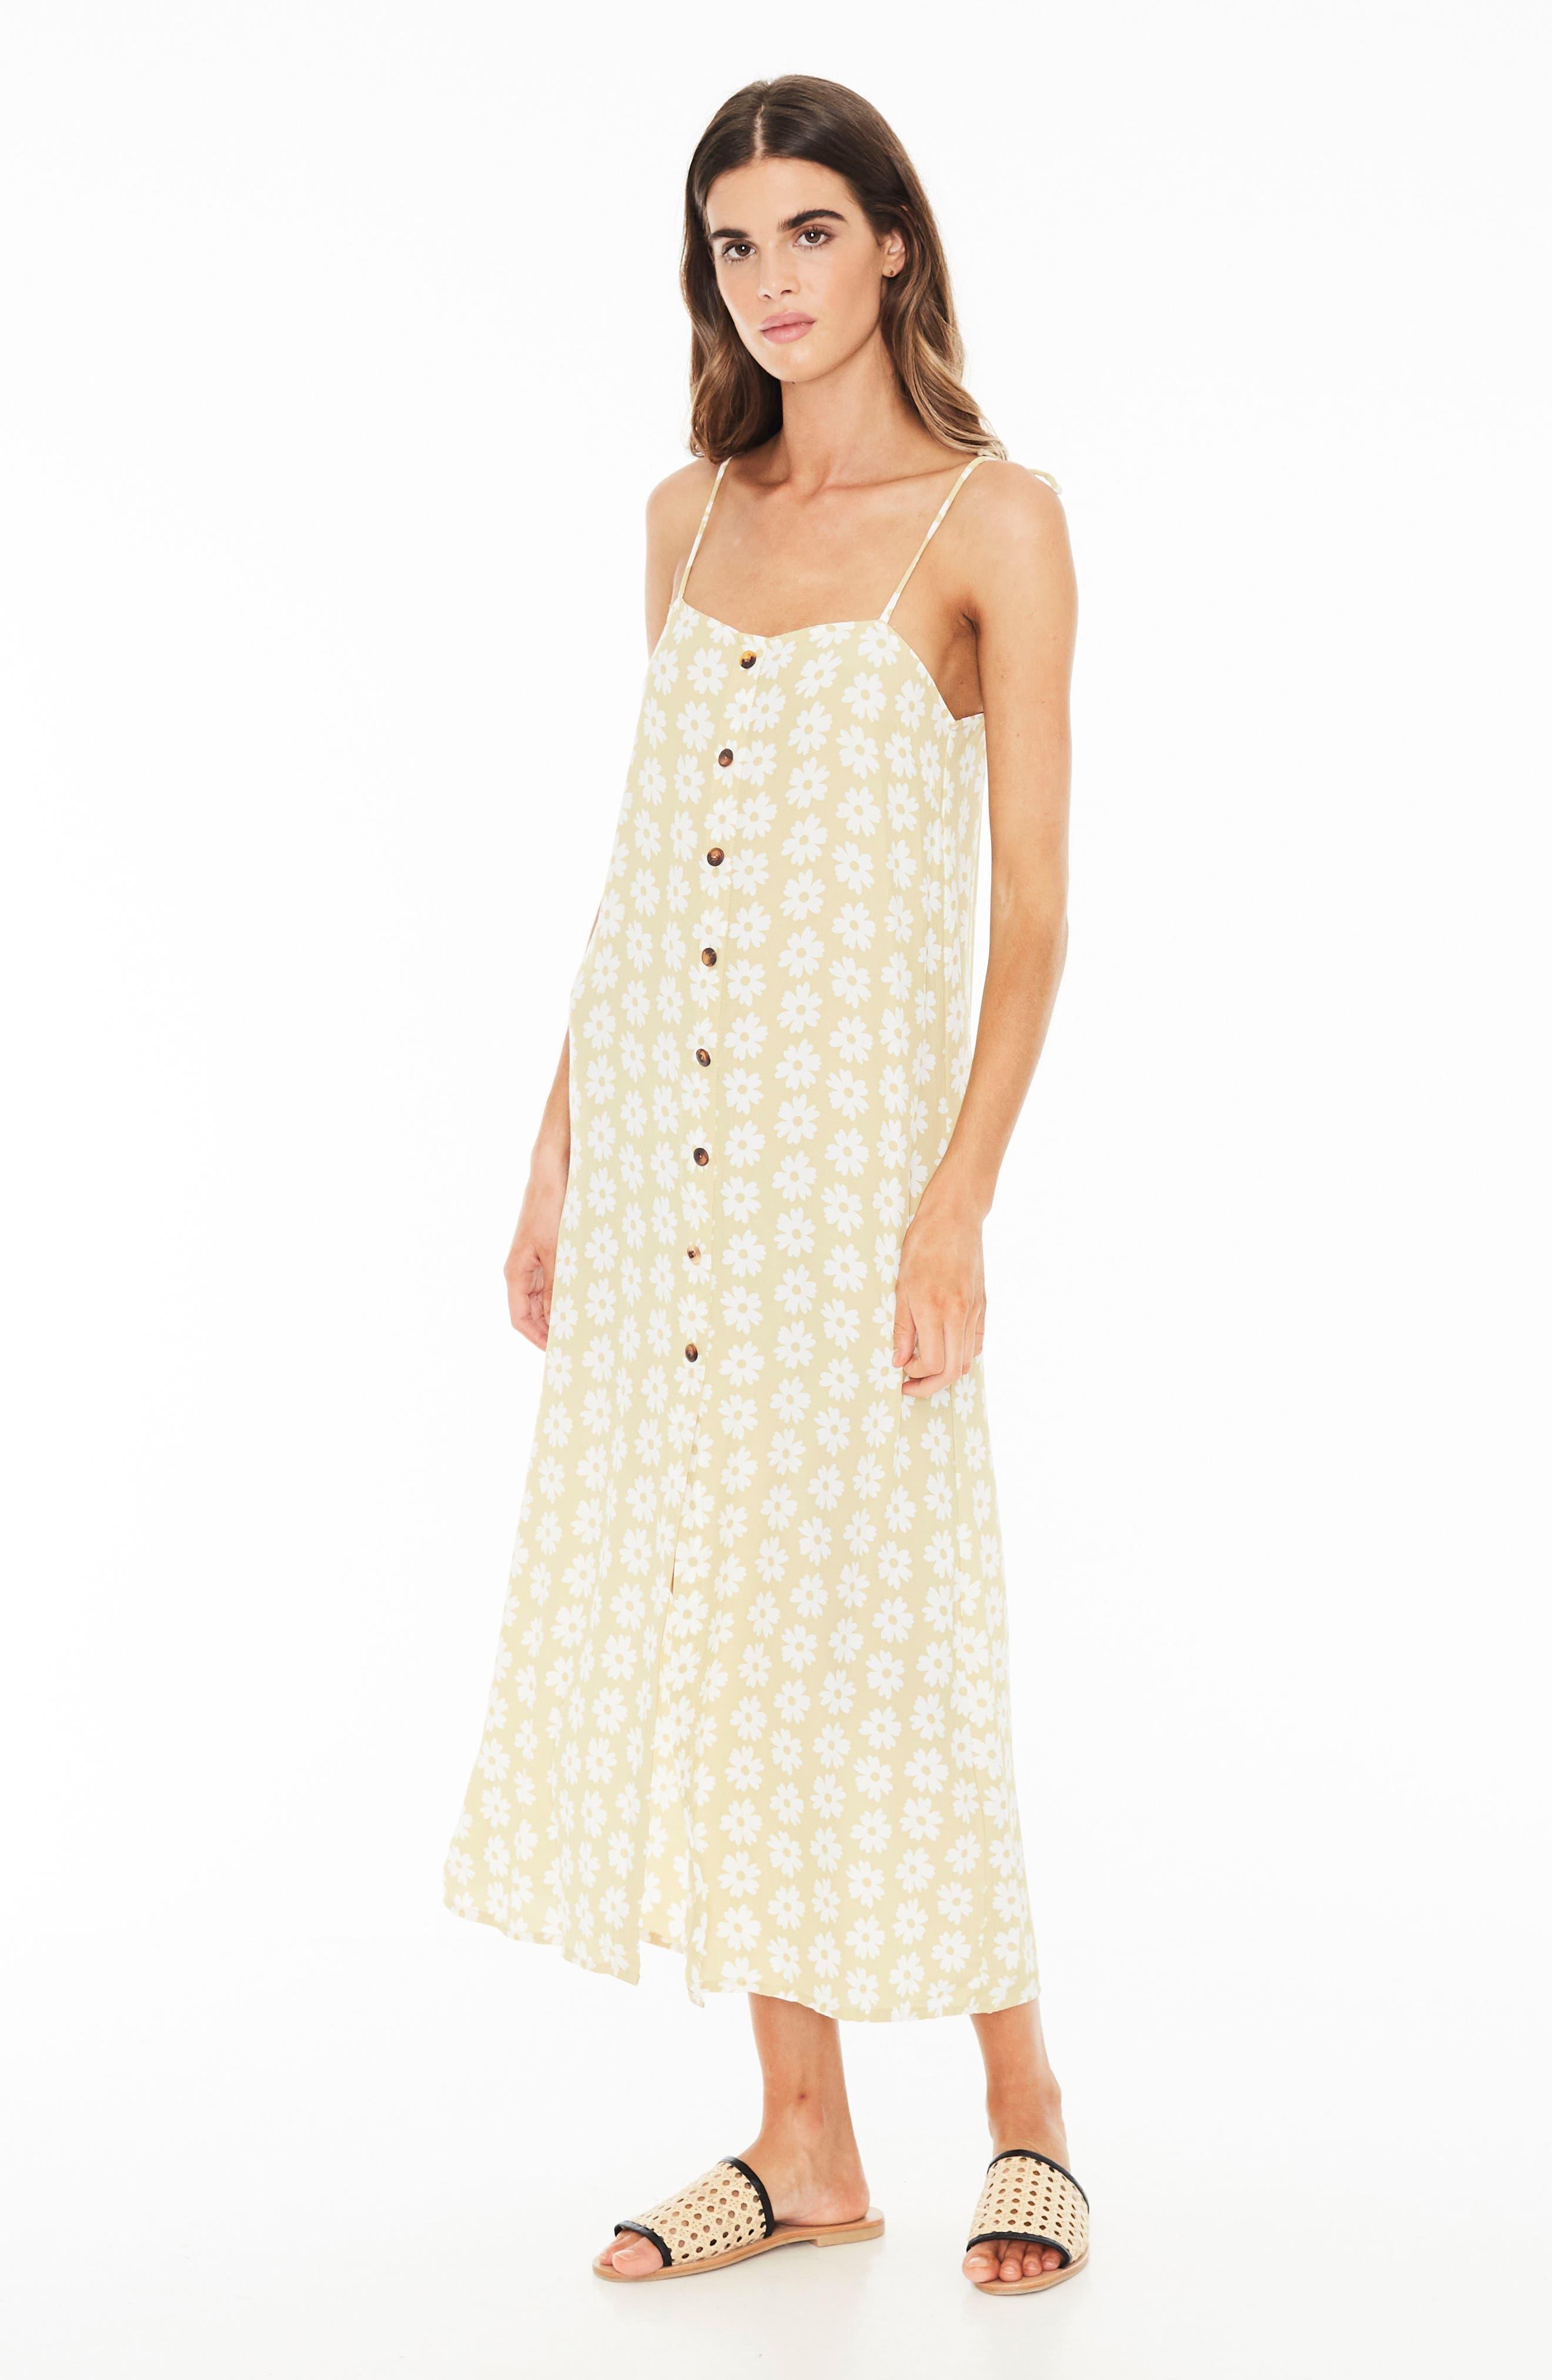 Arrieta Midi Dress,                             Alternate thumbnail 3, color,                             701